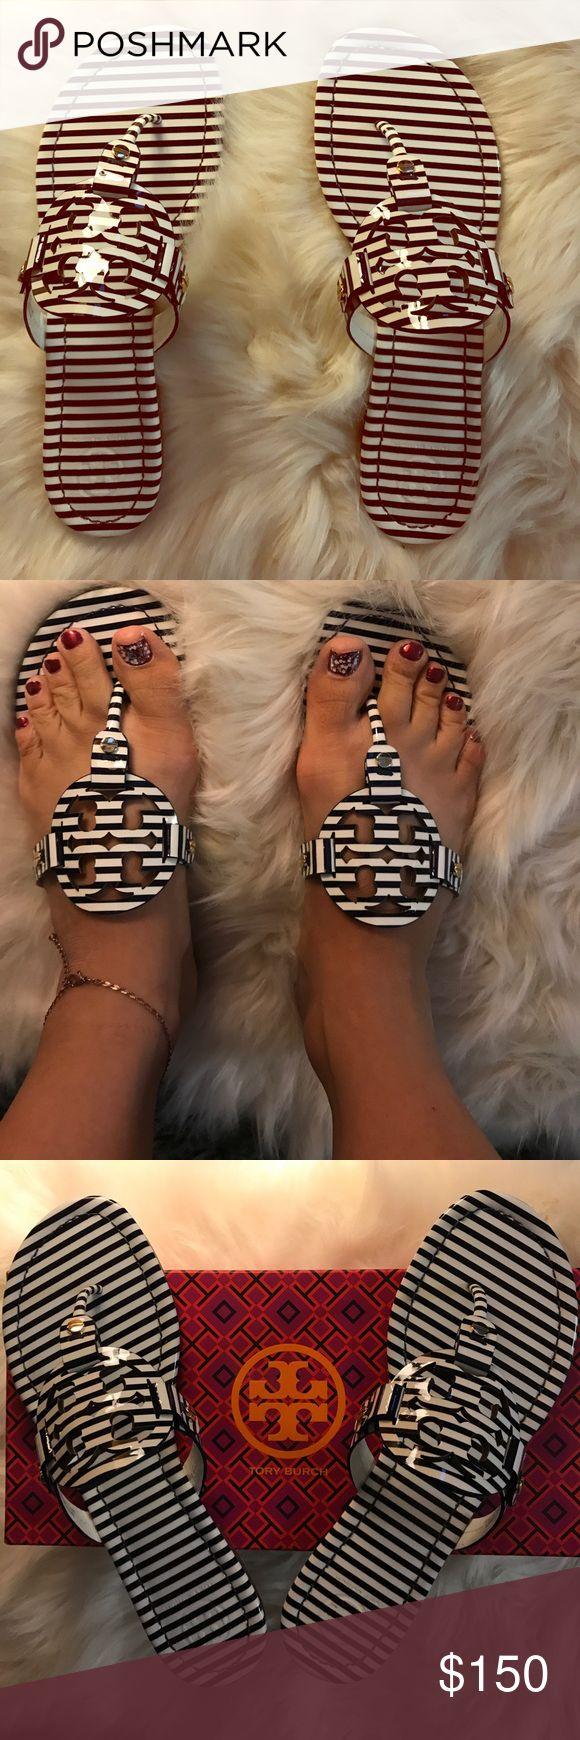 Tory Burch Nautical Sandals 💥Brand New in box💥 stunning Tory sandals Tory Burch Shoes Sandals